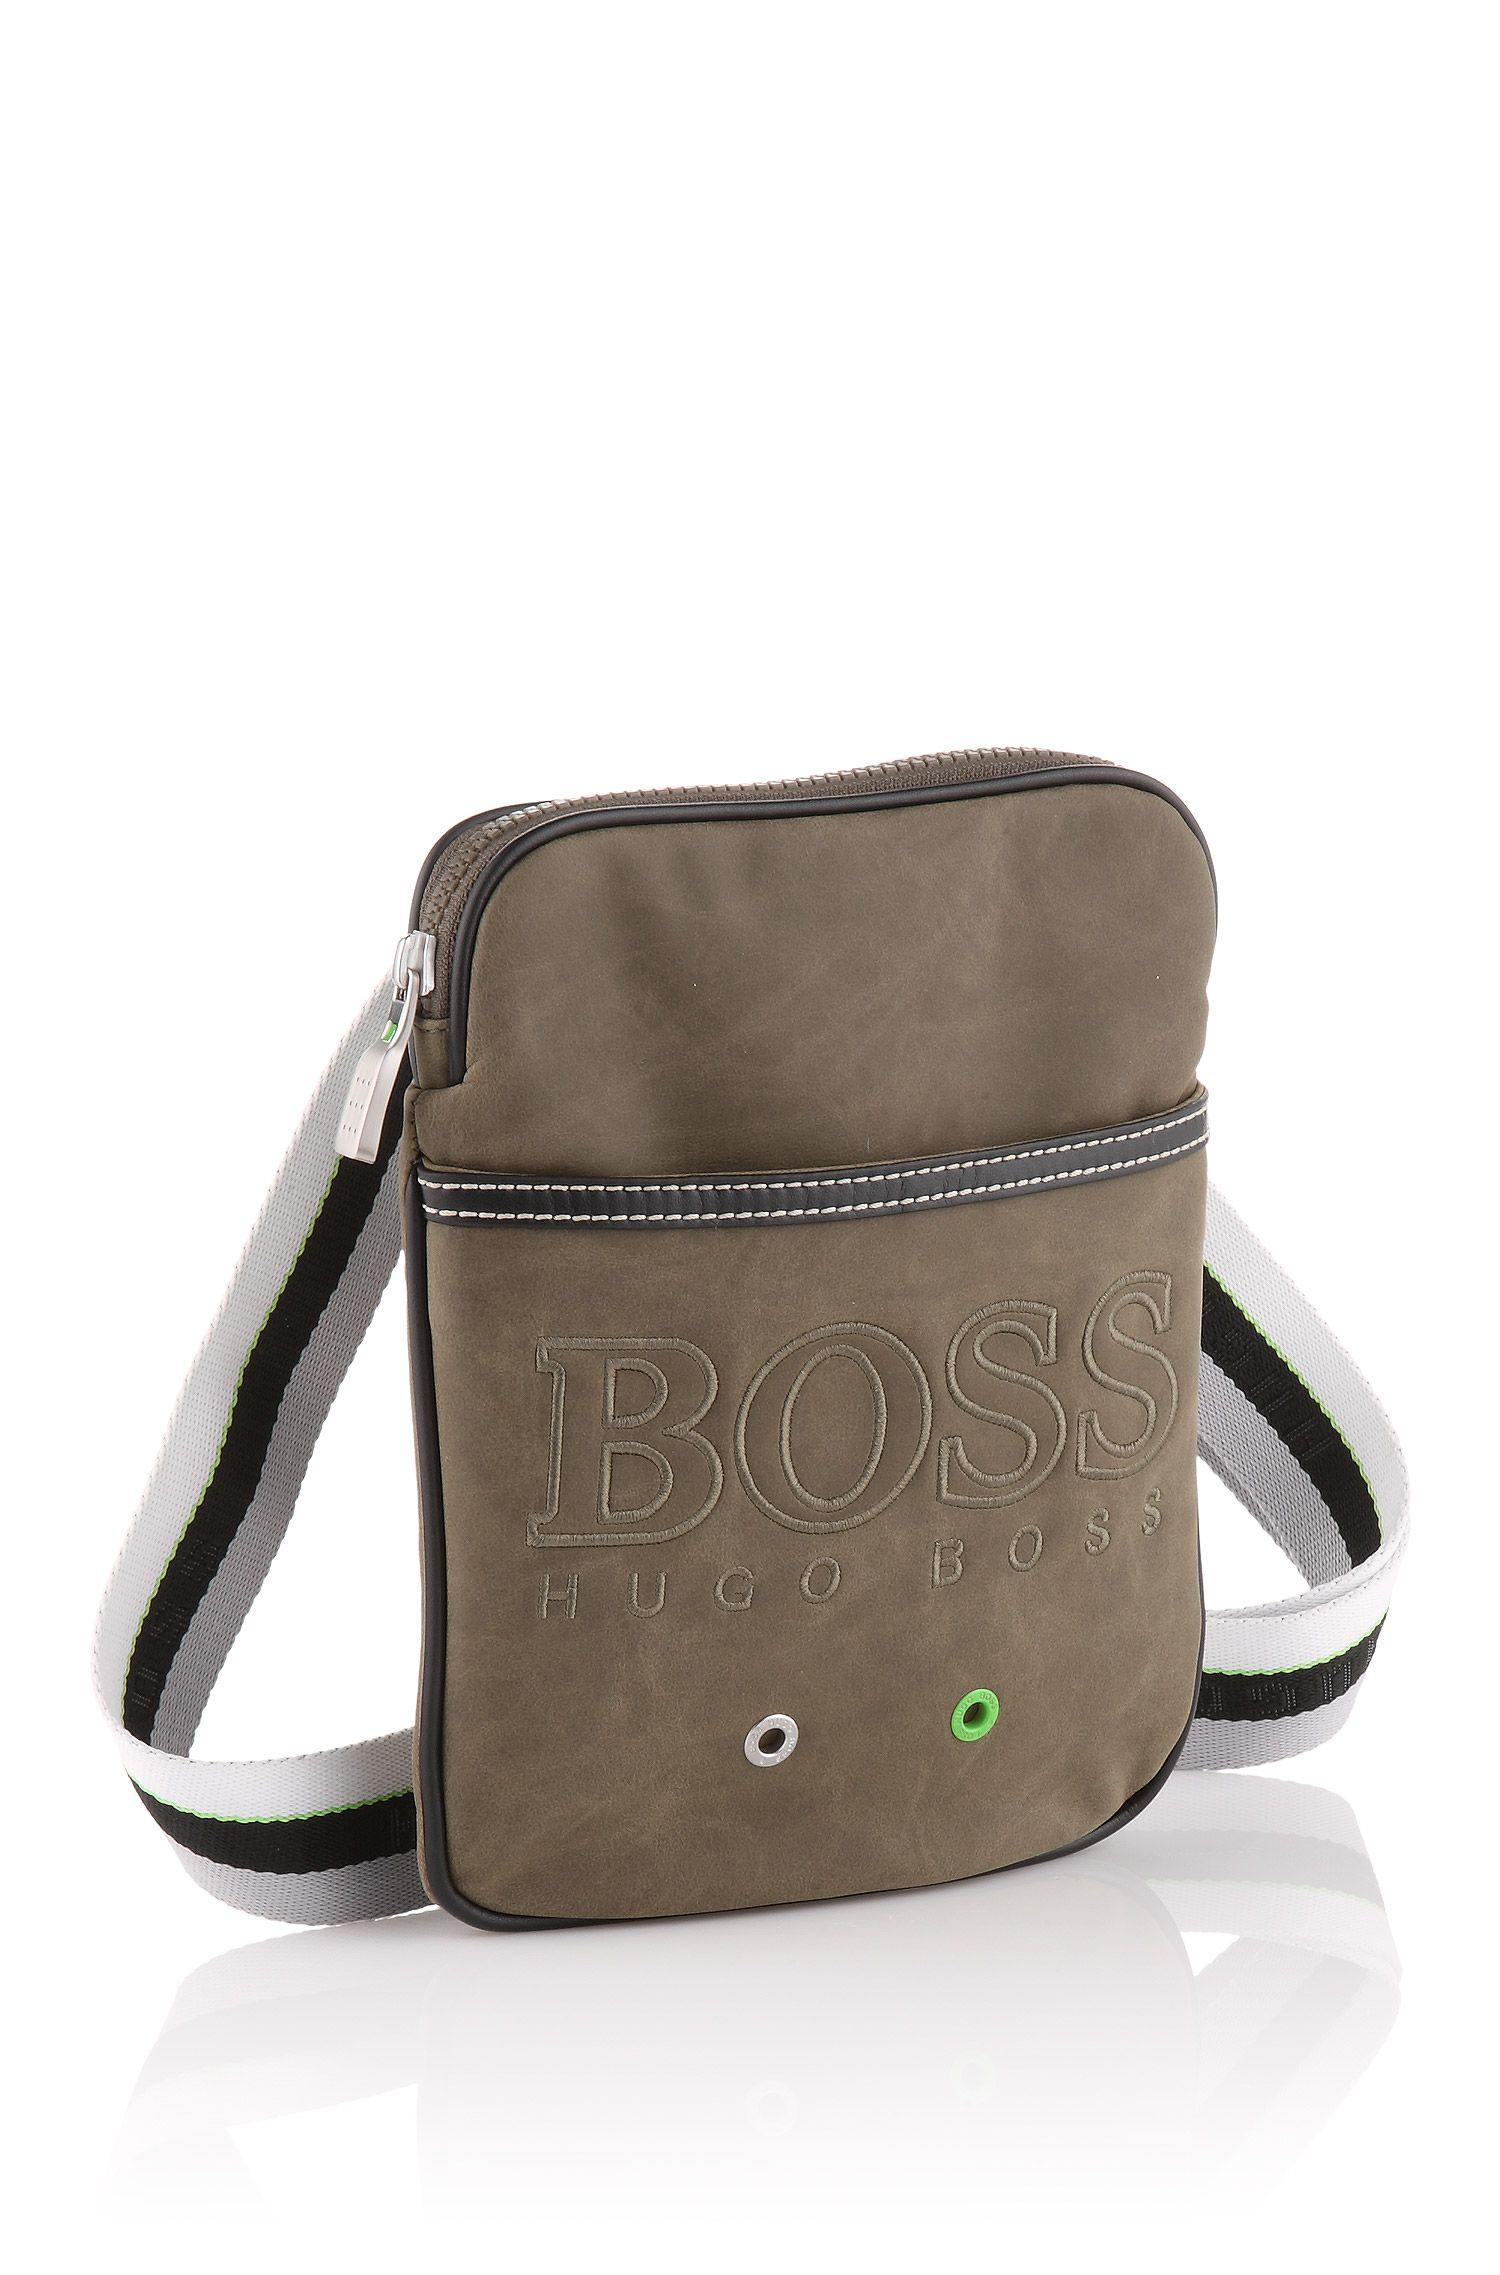 Bodybag avec bandoulière en textile rayé, Frobel